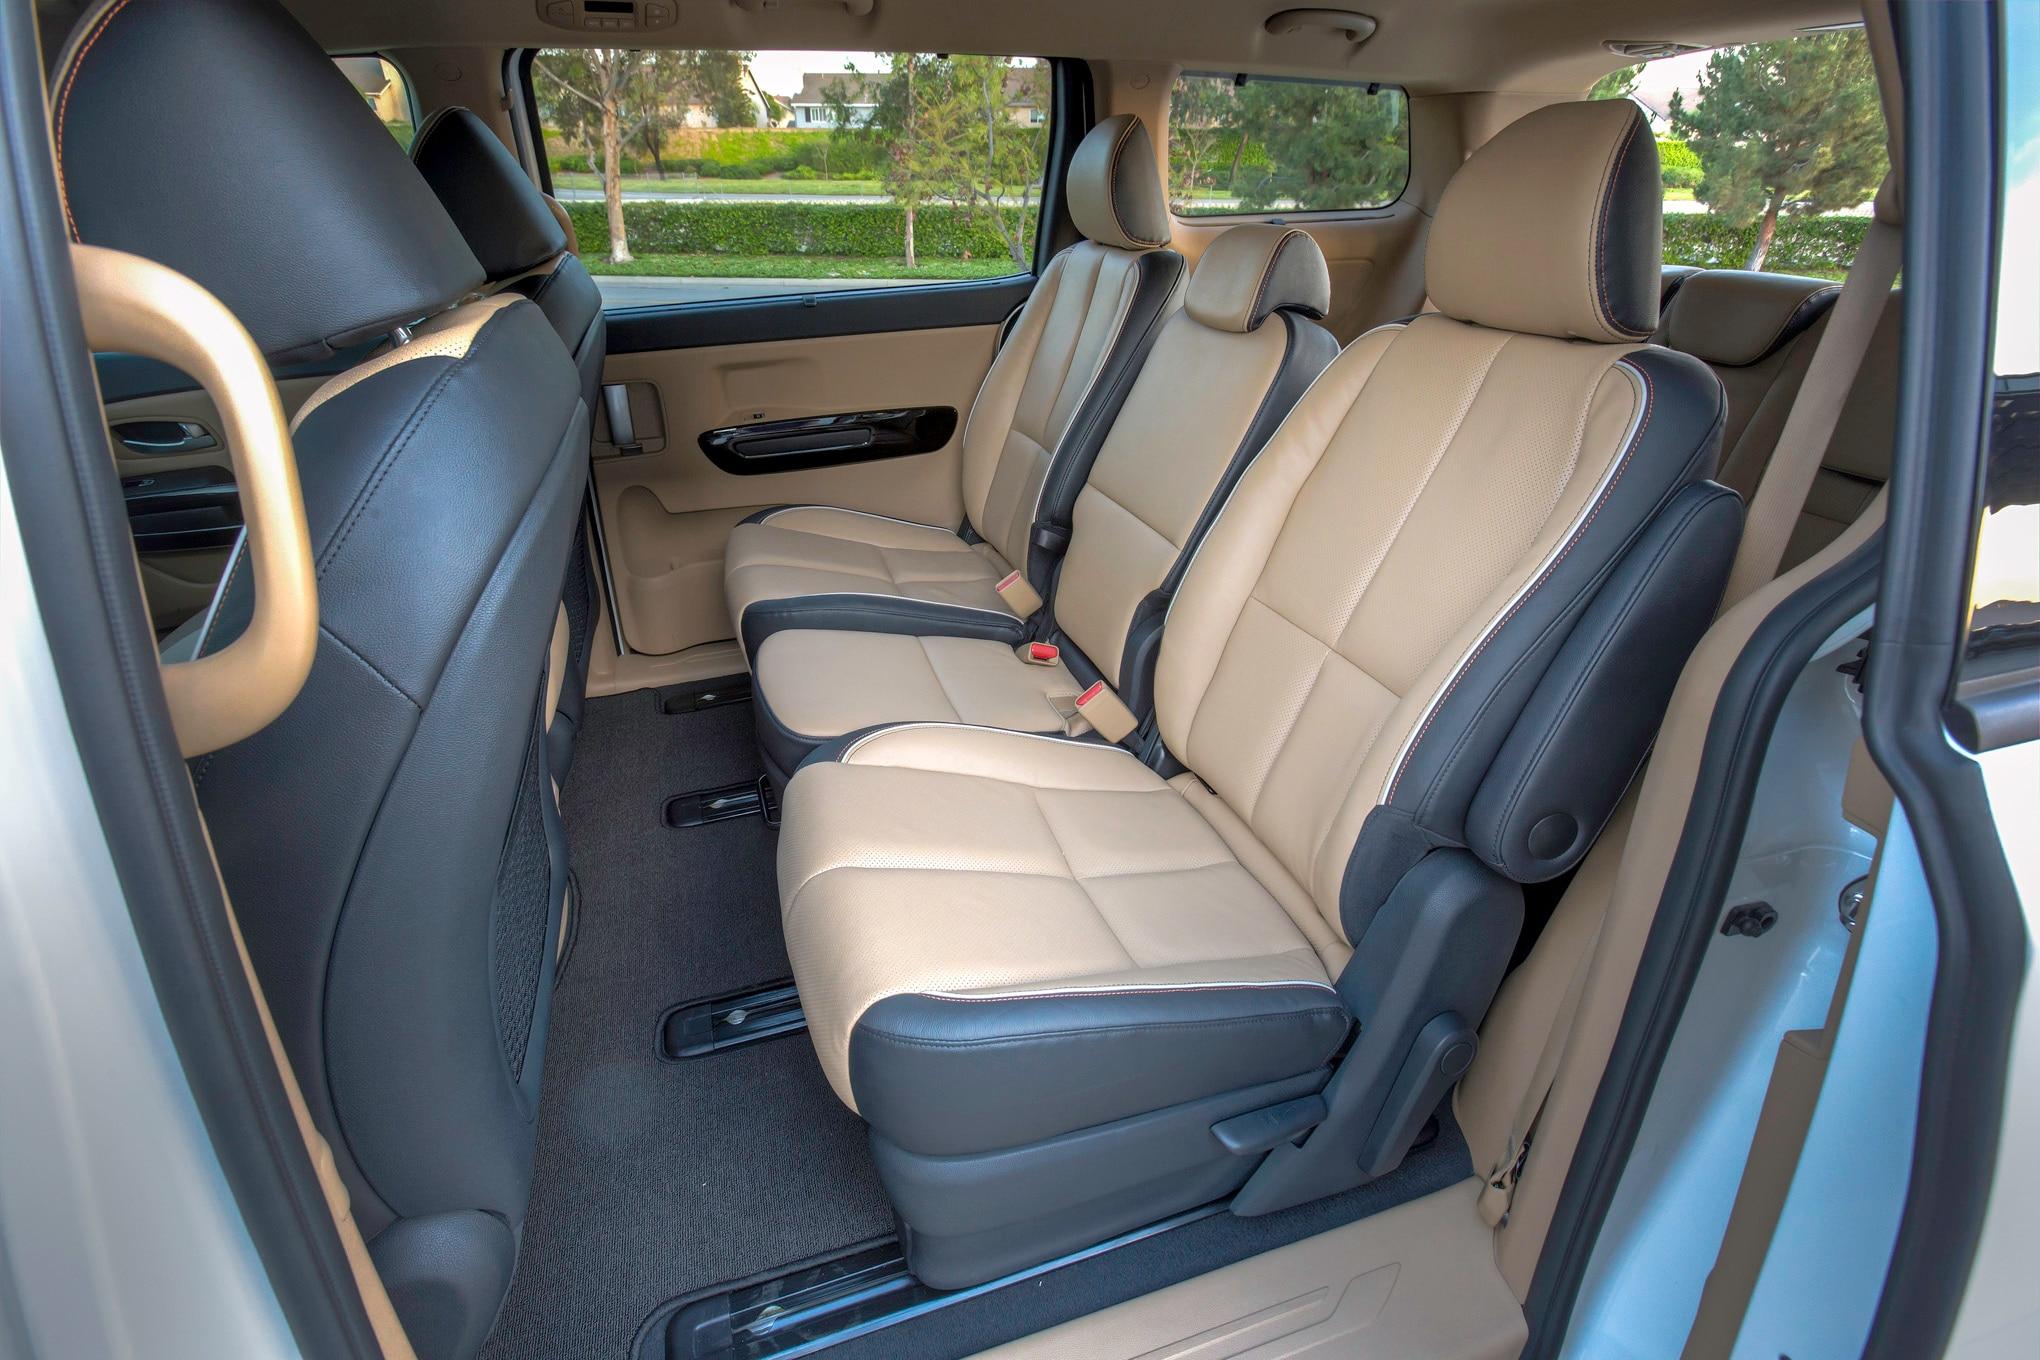 2016 Kia Soo Consumer Reviews New Cars Used Car